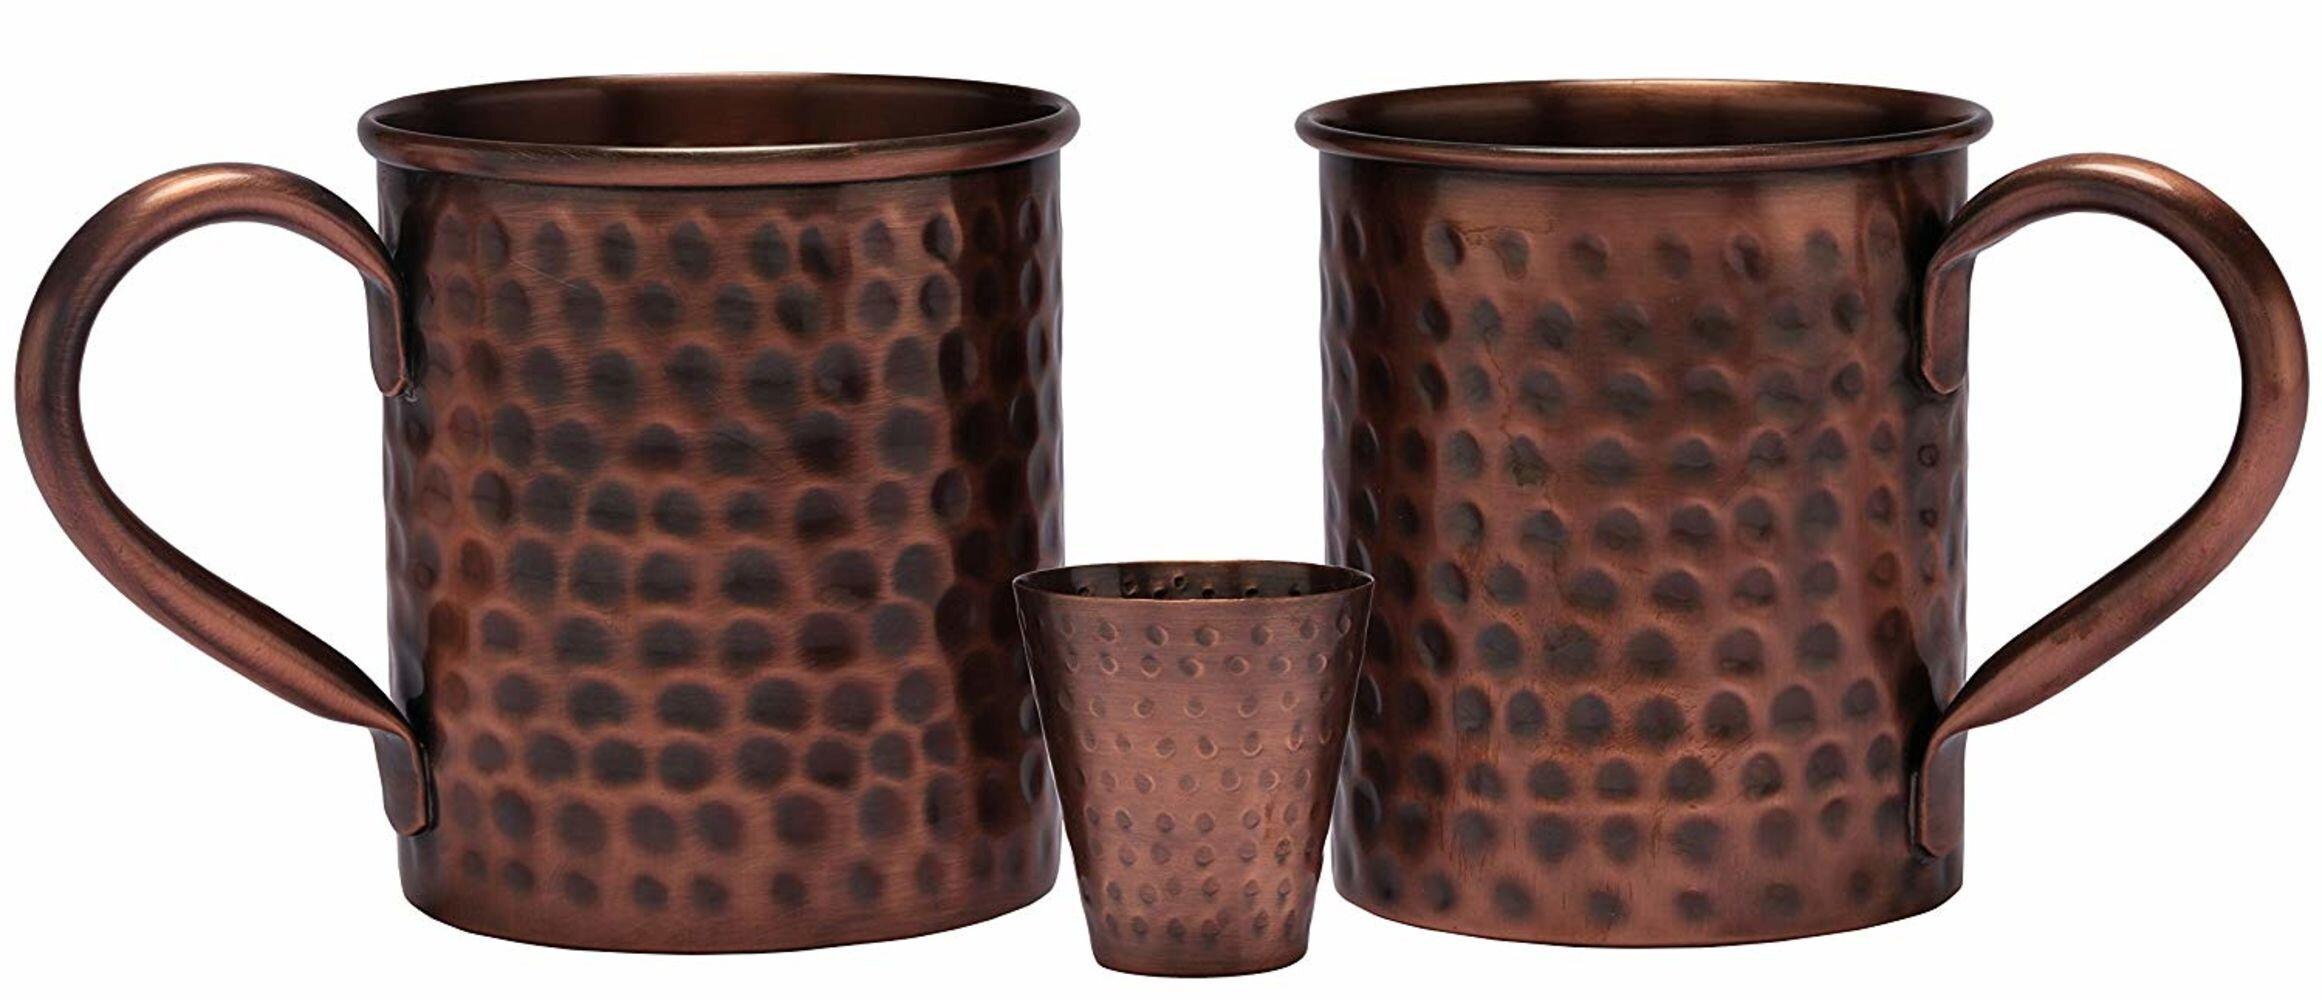 Geometric Catereco Moscow Mule Mugs You Ll Love In 2021 Wayfair